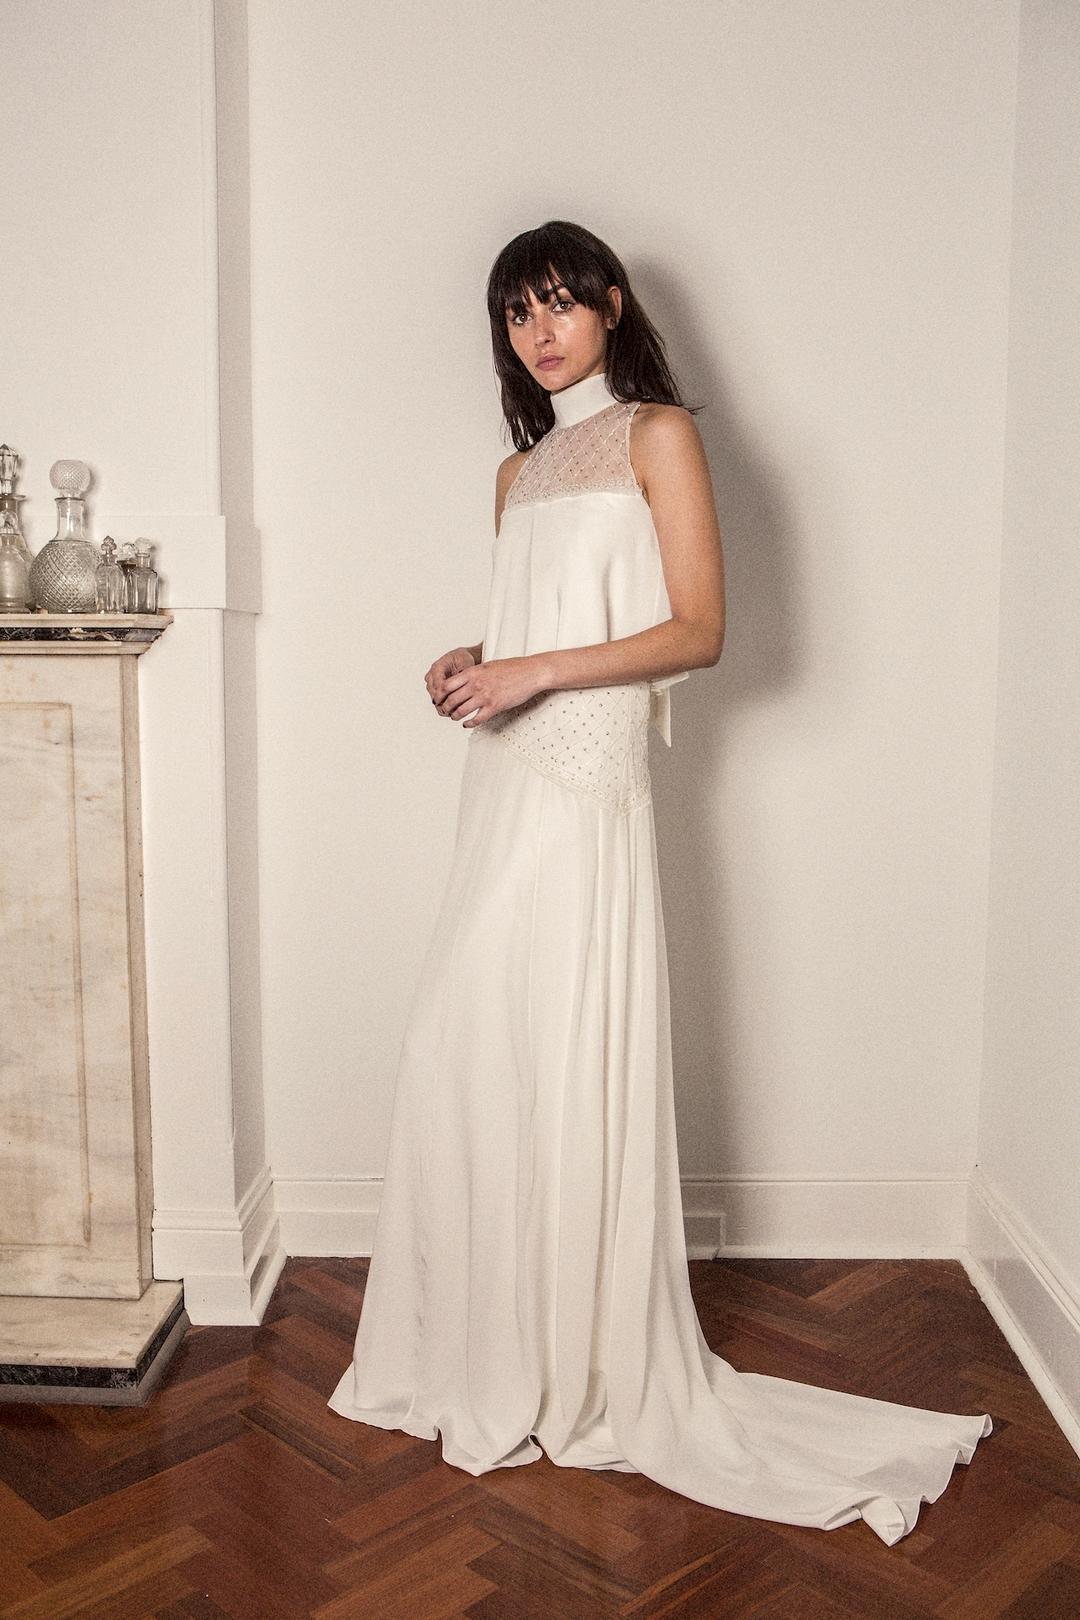 aria gown dress photo